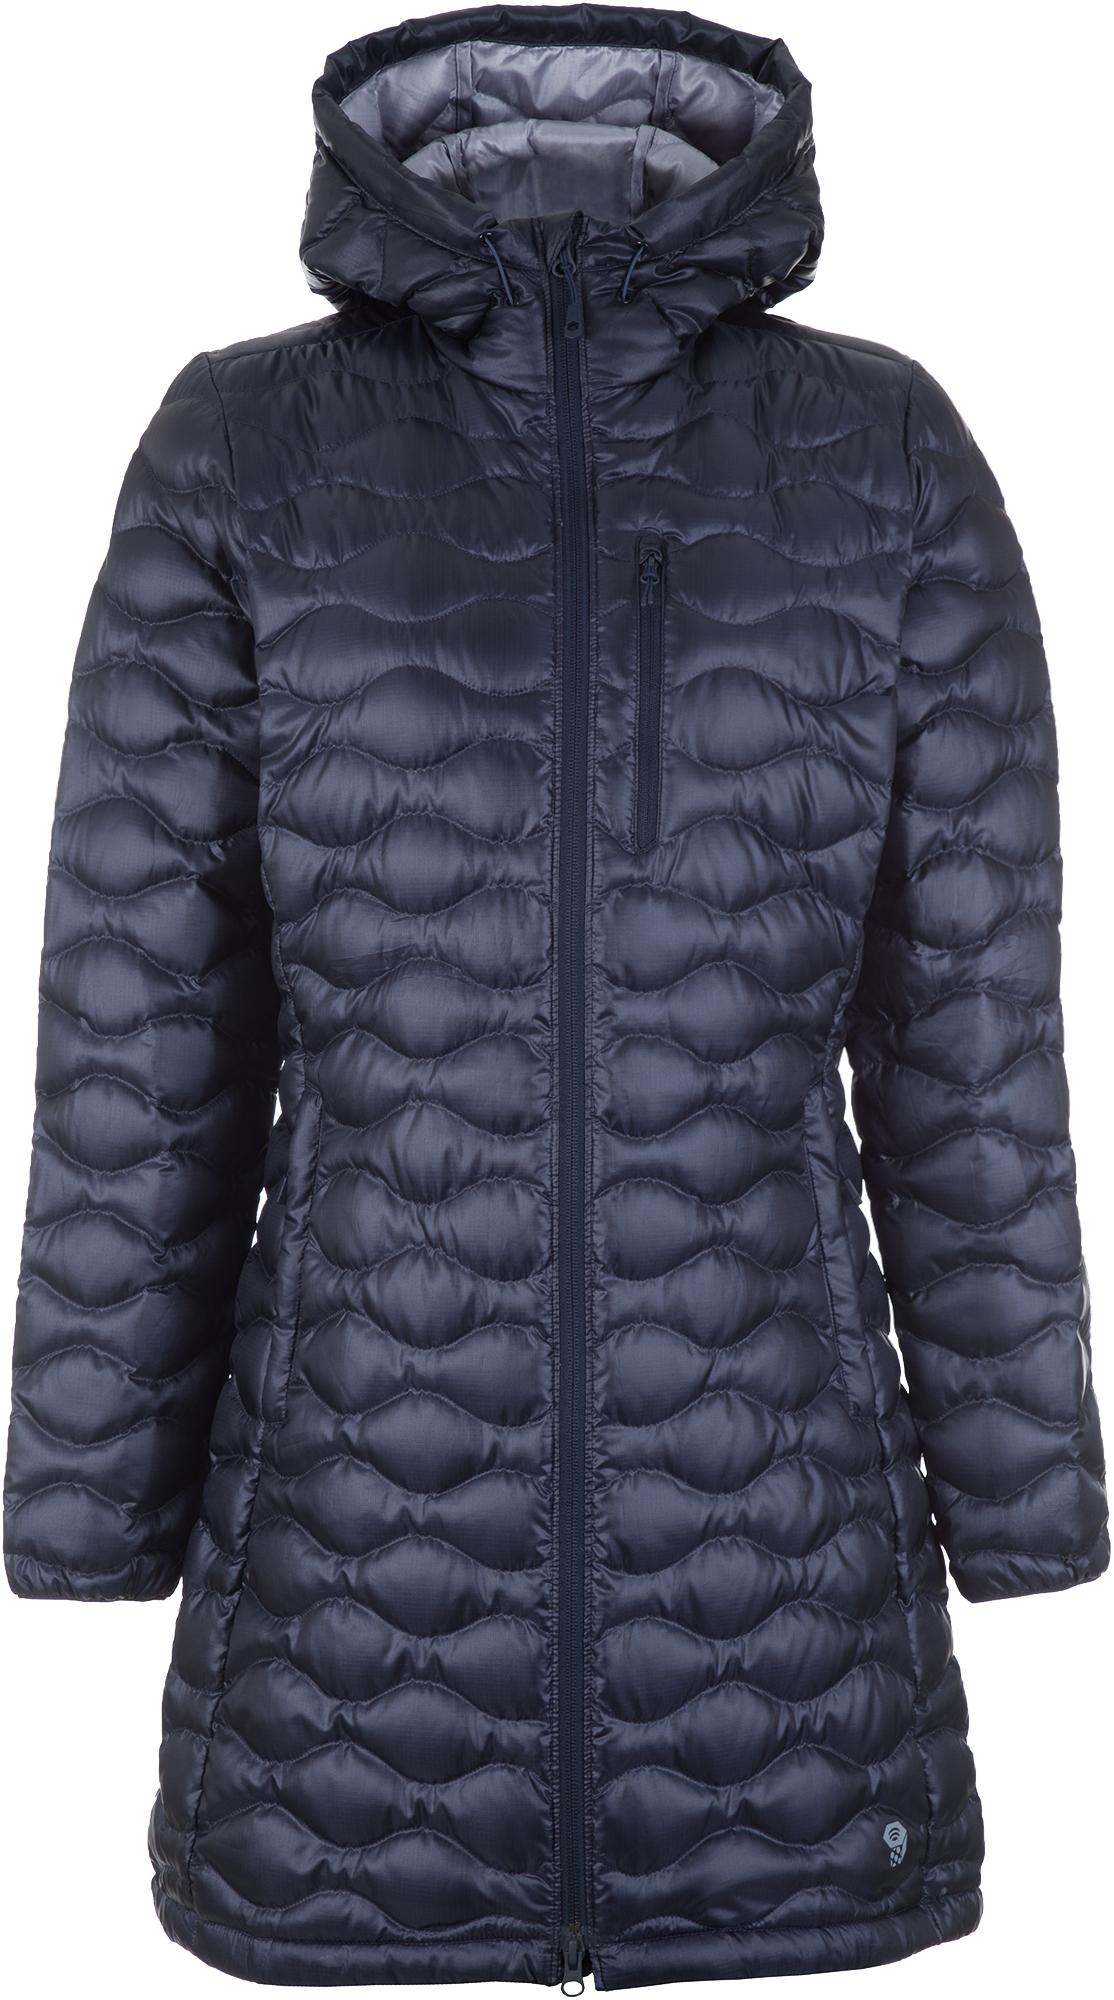 Mountain Hardwear Куртка пуховая женская Mountain Hardwear Nitrous, размер 50